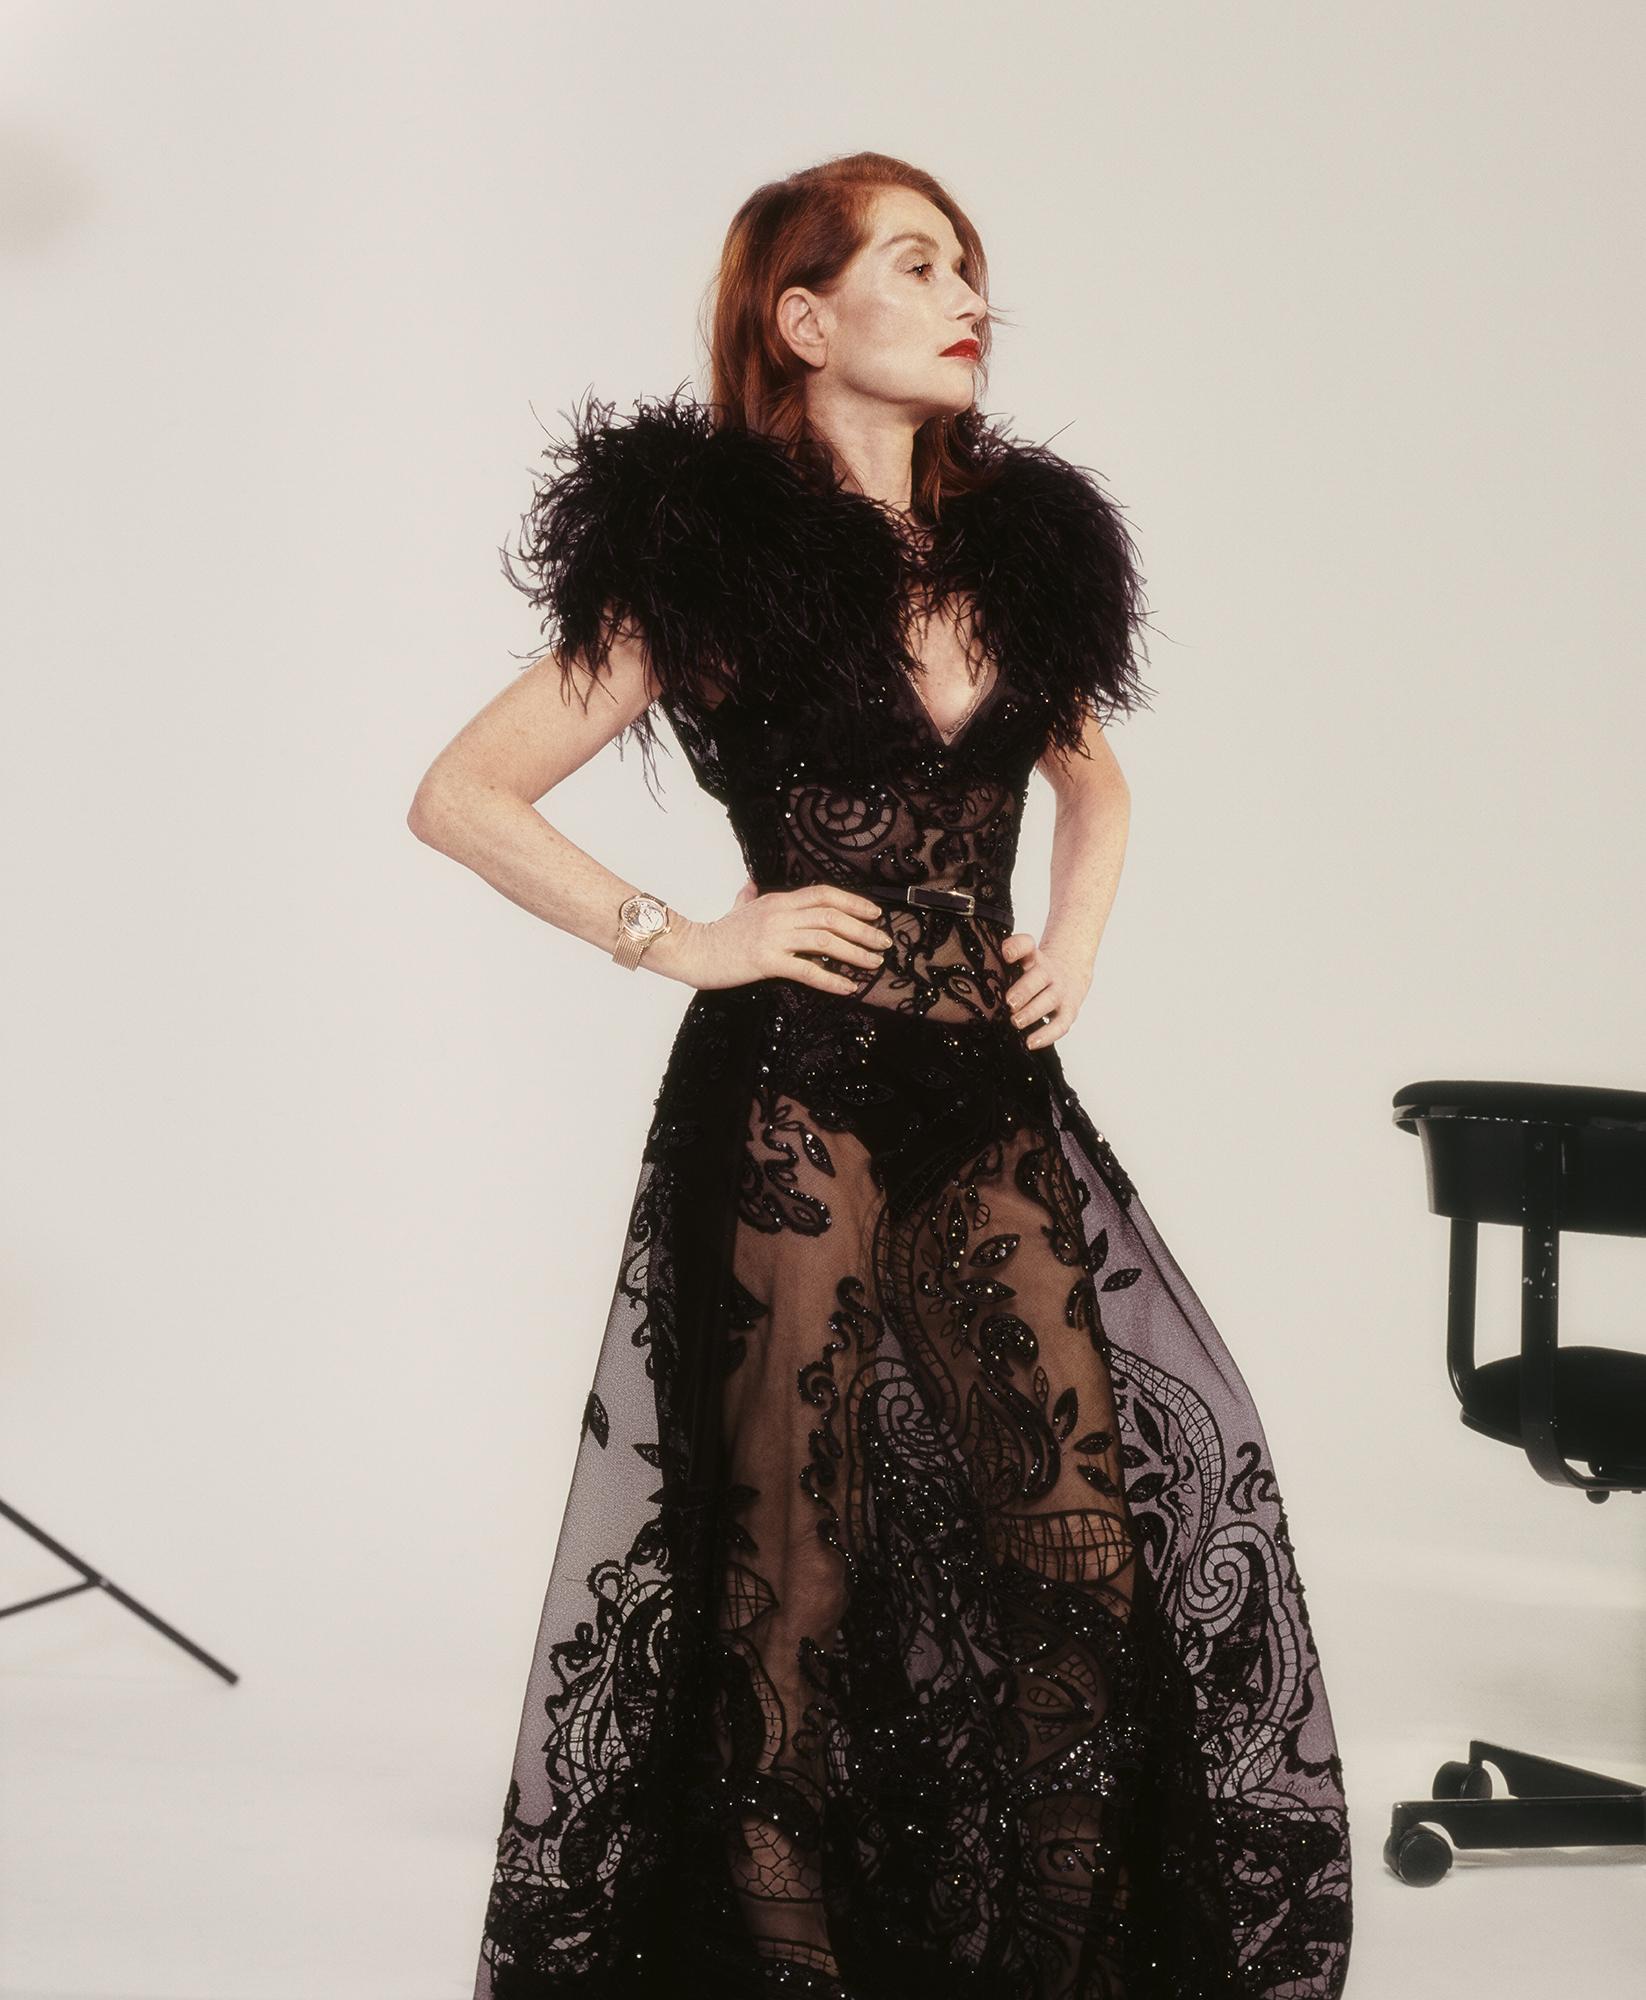 Isabelle Huppert Elie Saab Haute Couture interview fro crash magazine